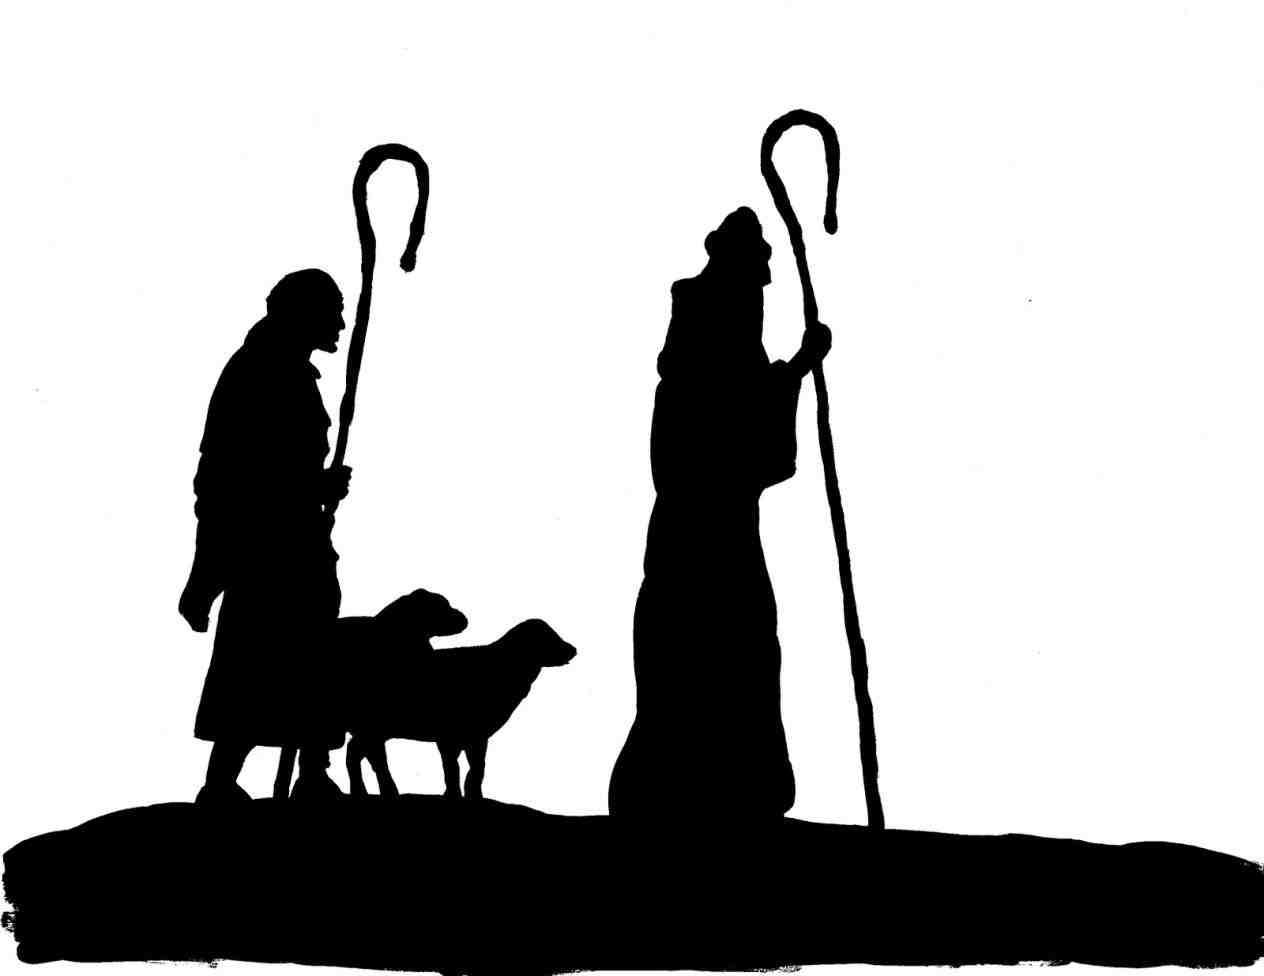 1264x976 Christmas Wisemen Clipart Wise Men Nativity Silhouette U Clip Art